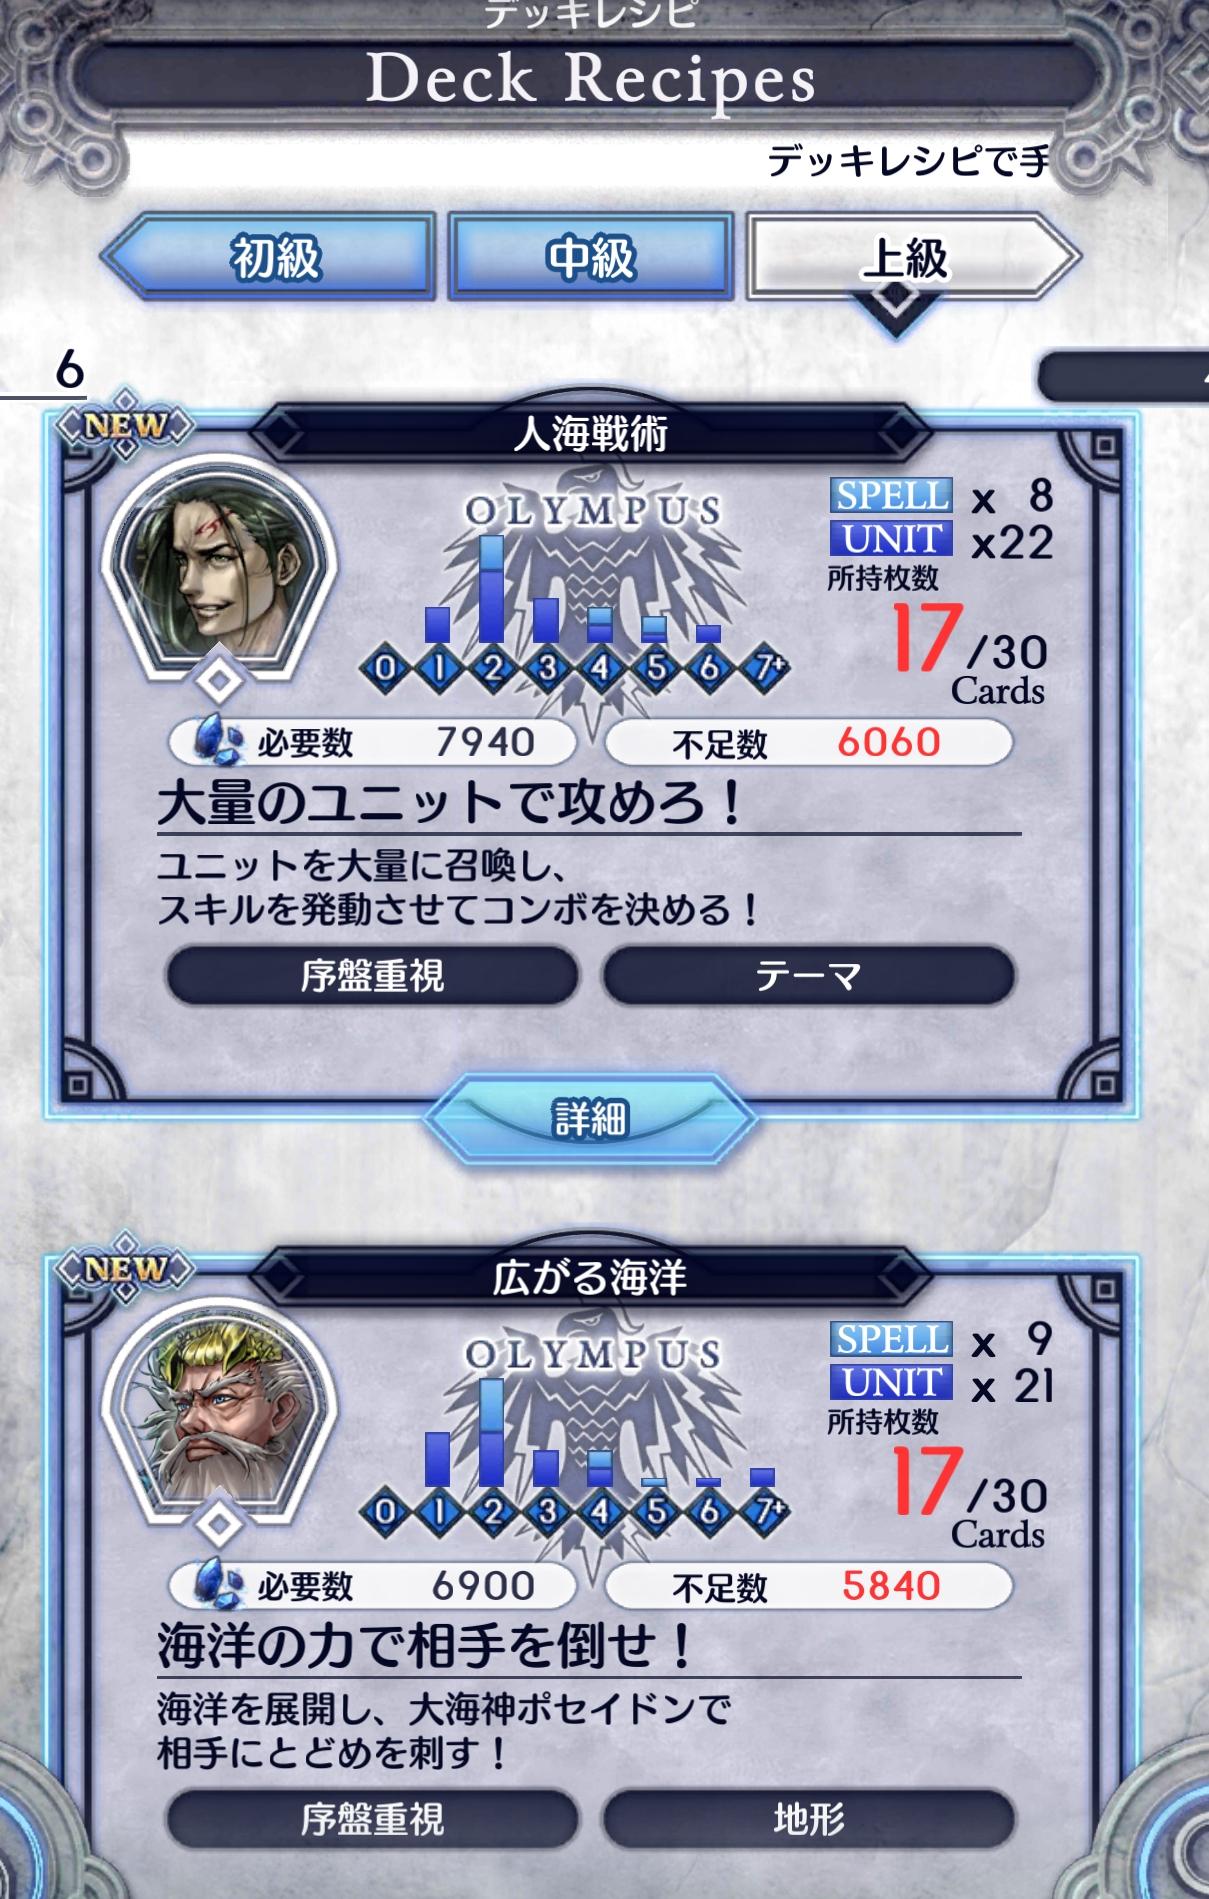 【PR】デュエル エクス マキナ【攻略】:Game Deets流のデッキ編成術を指南!